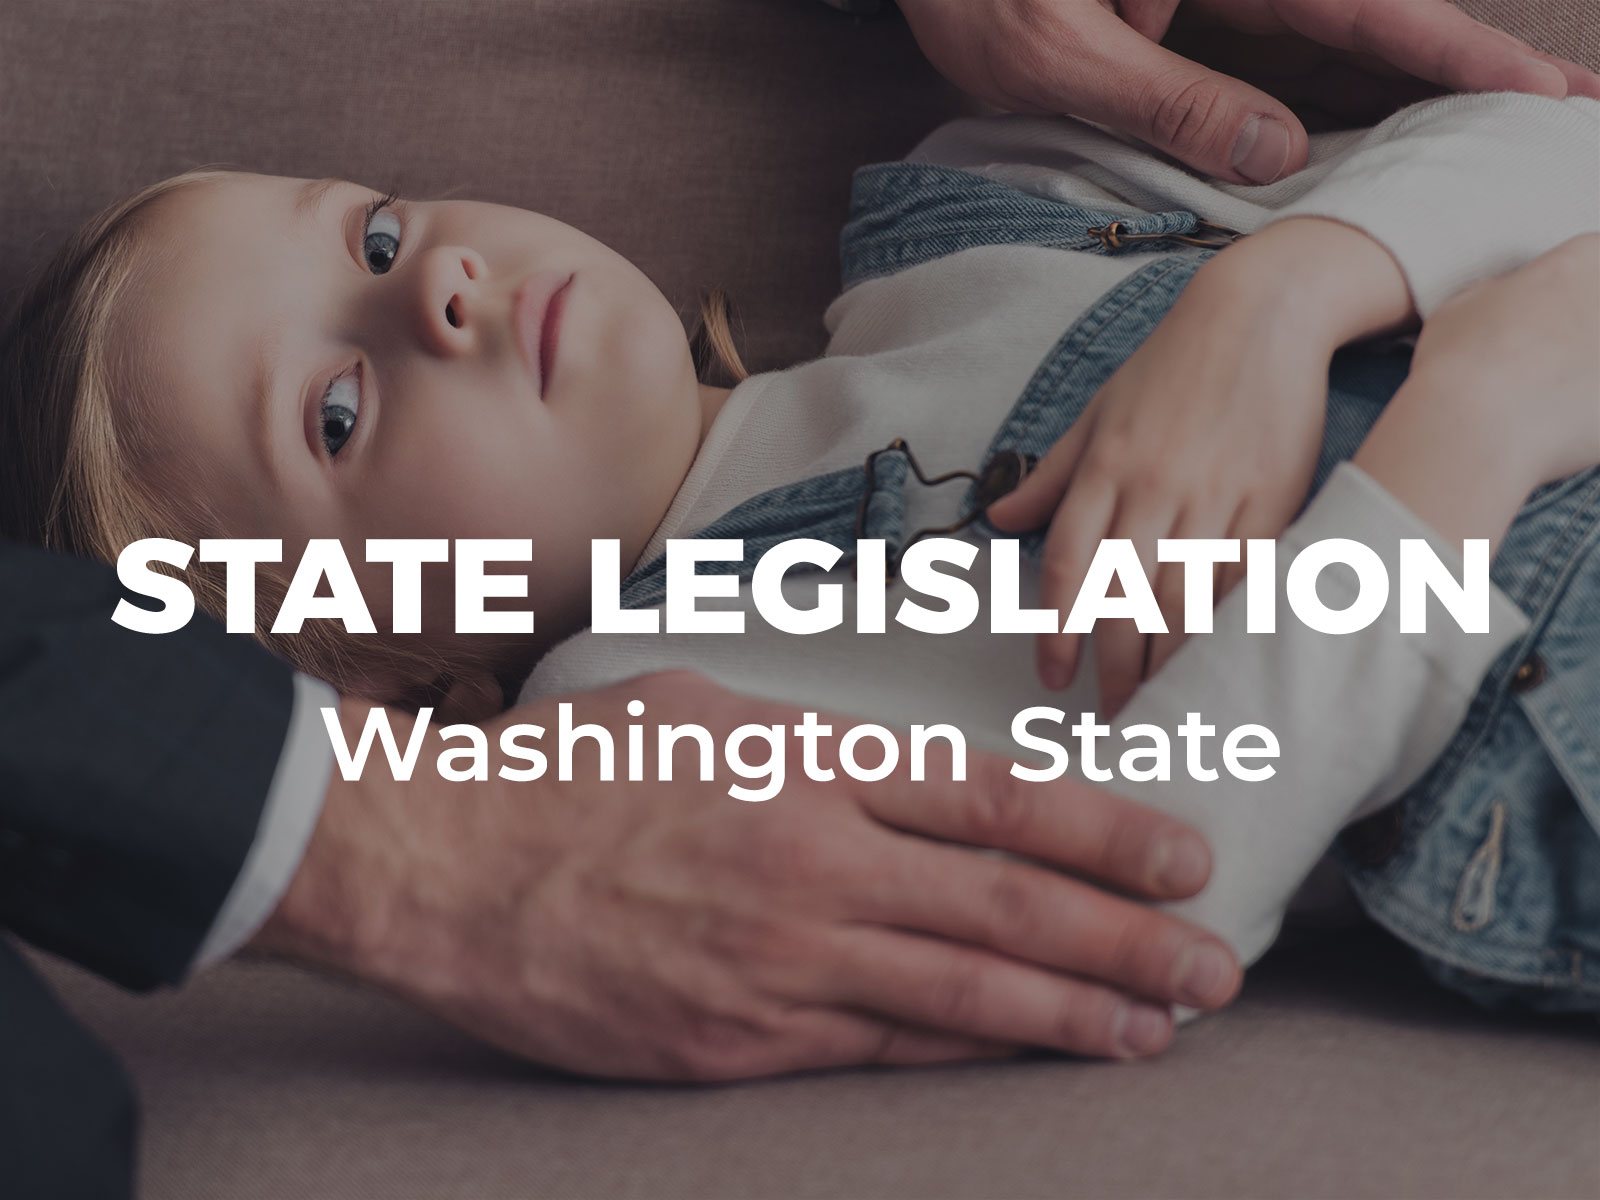 End Faith Healing in Washington State